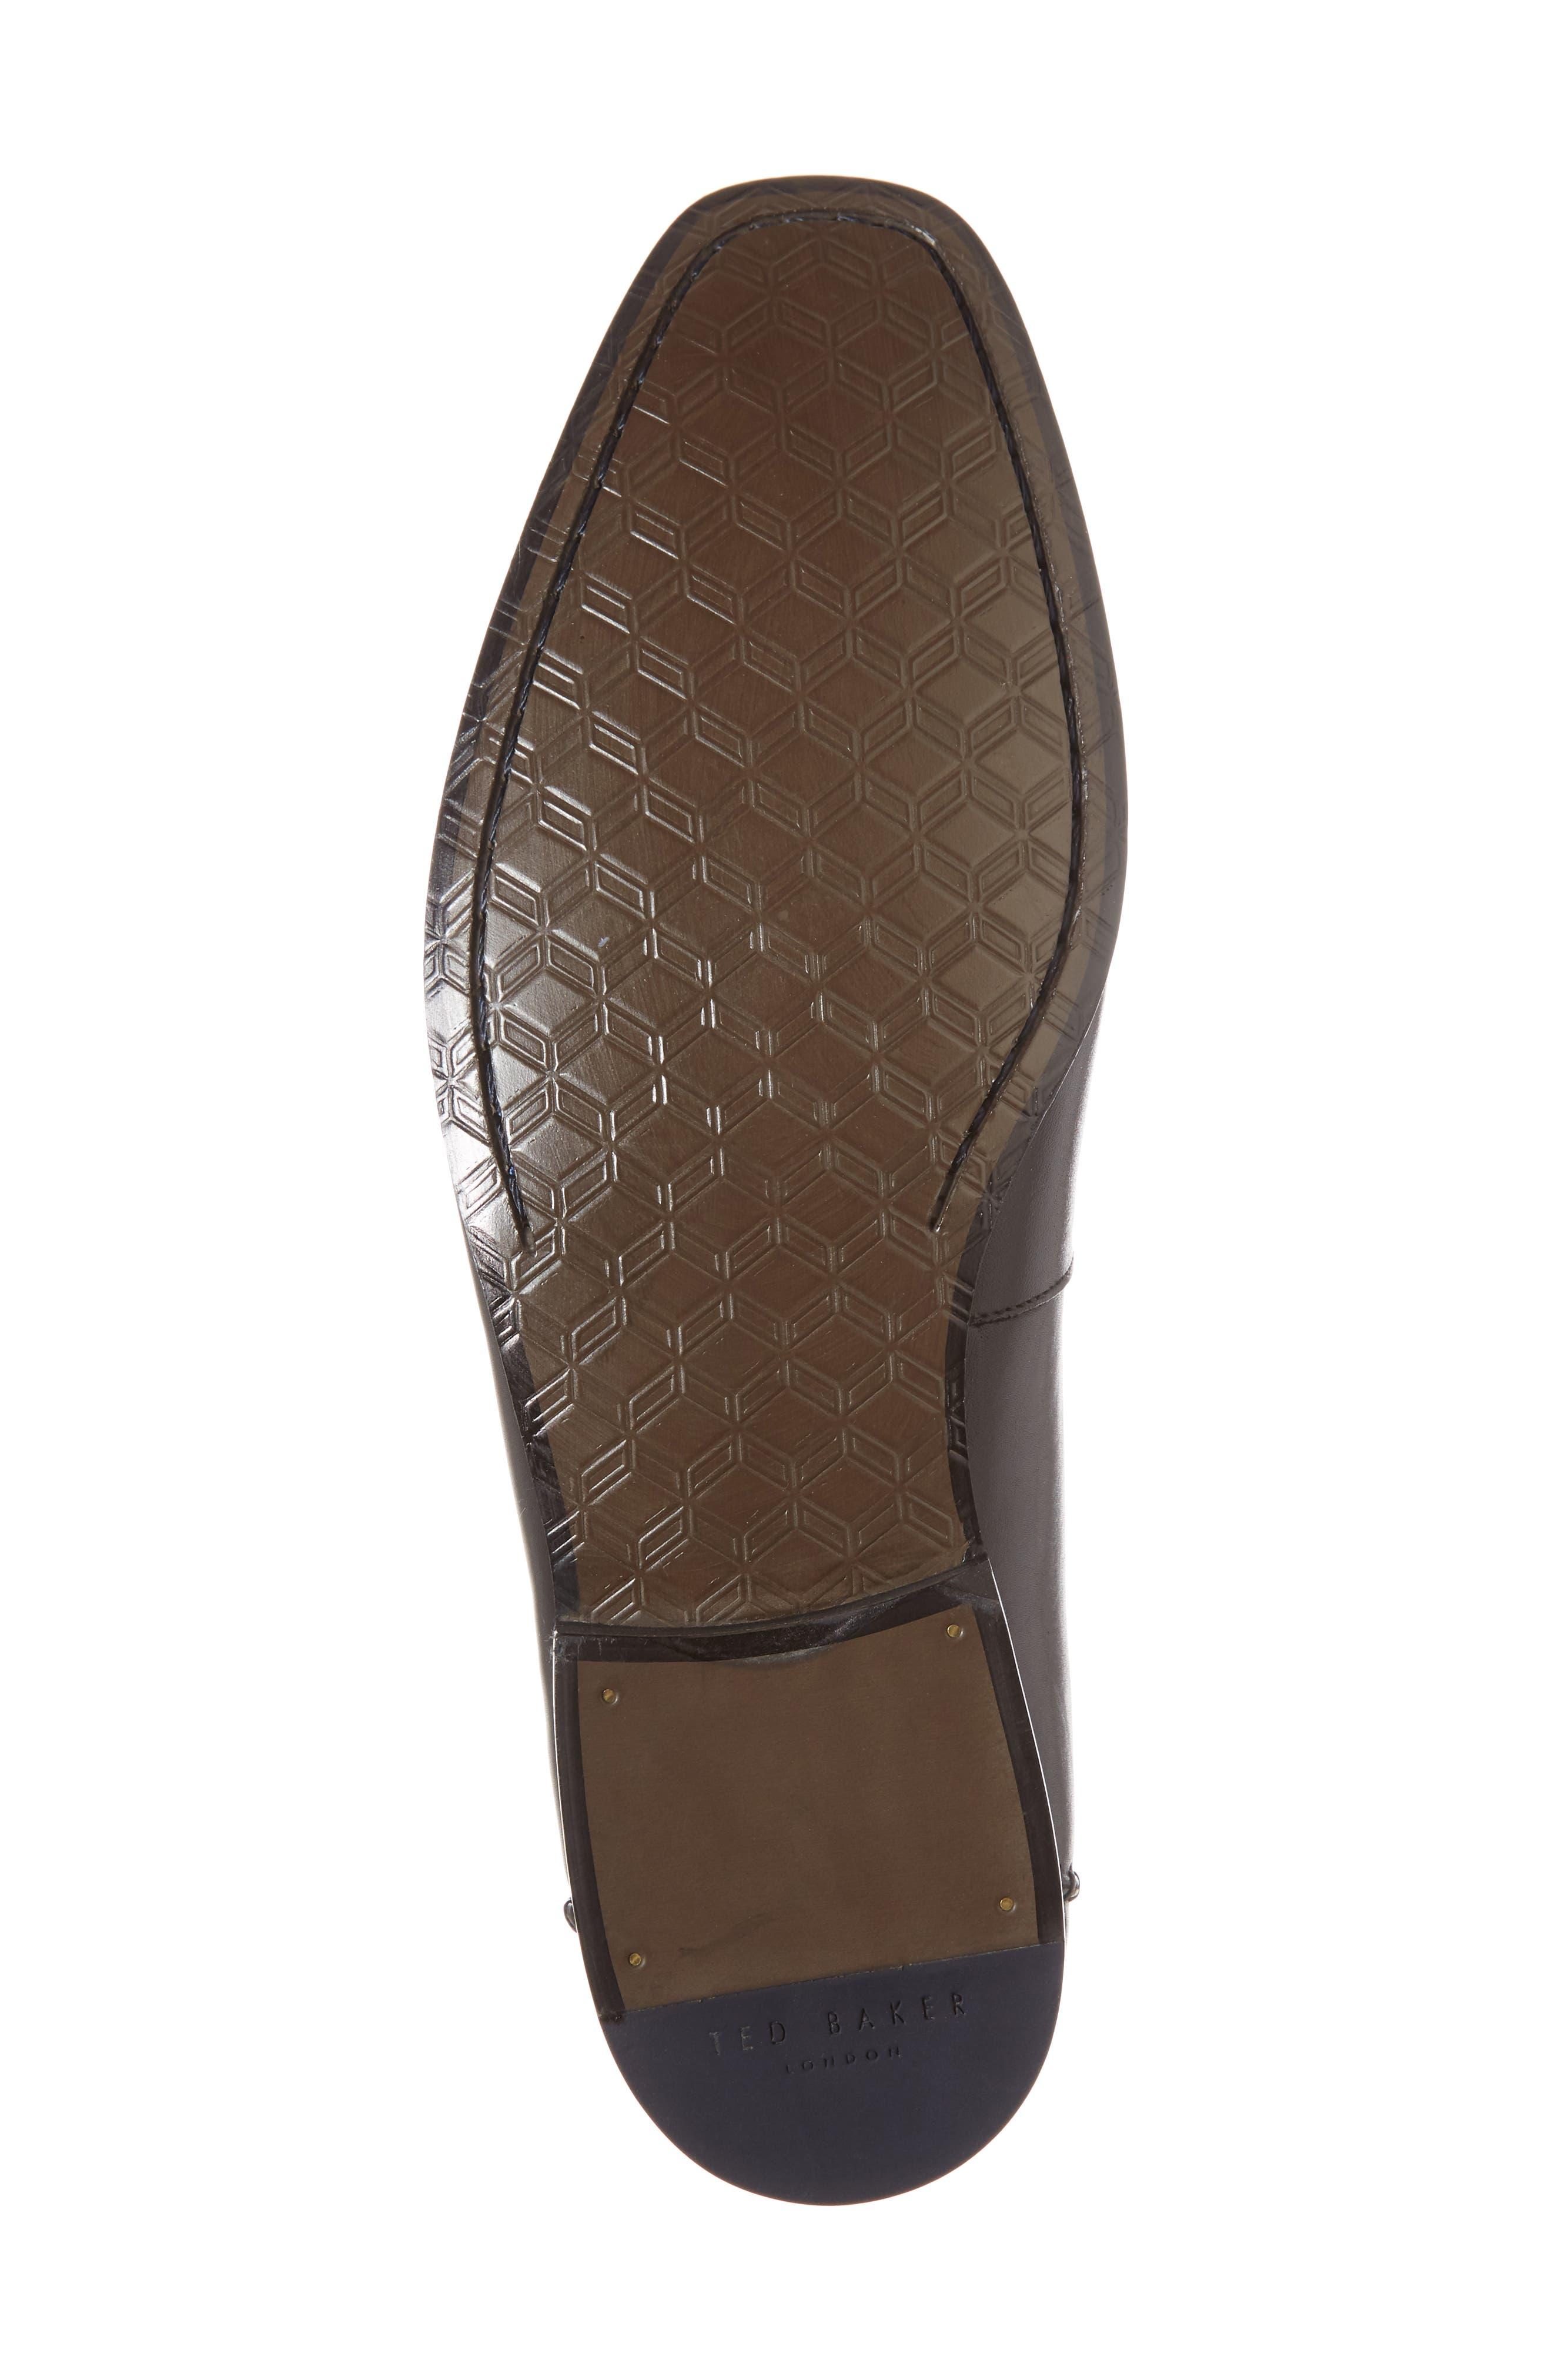 Bly 9 Venetian Loafer,                             Alternate thumbnail 6, color,                             BLACK LEATHER